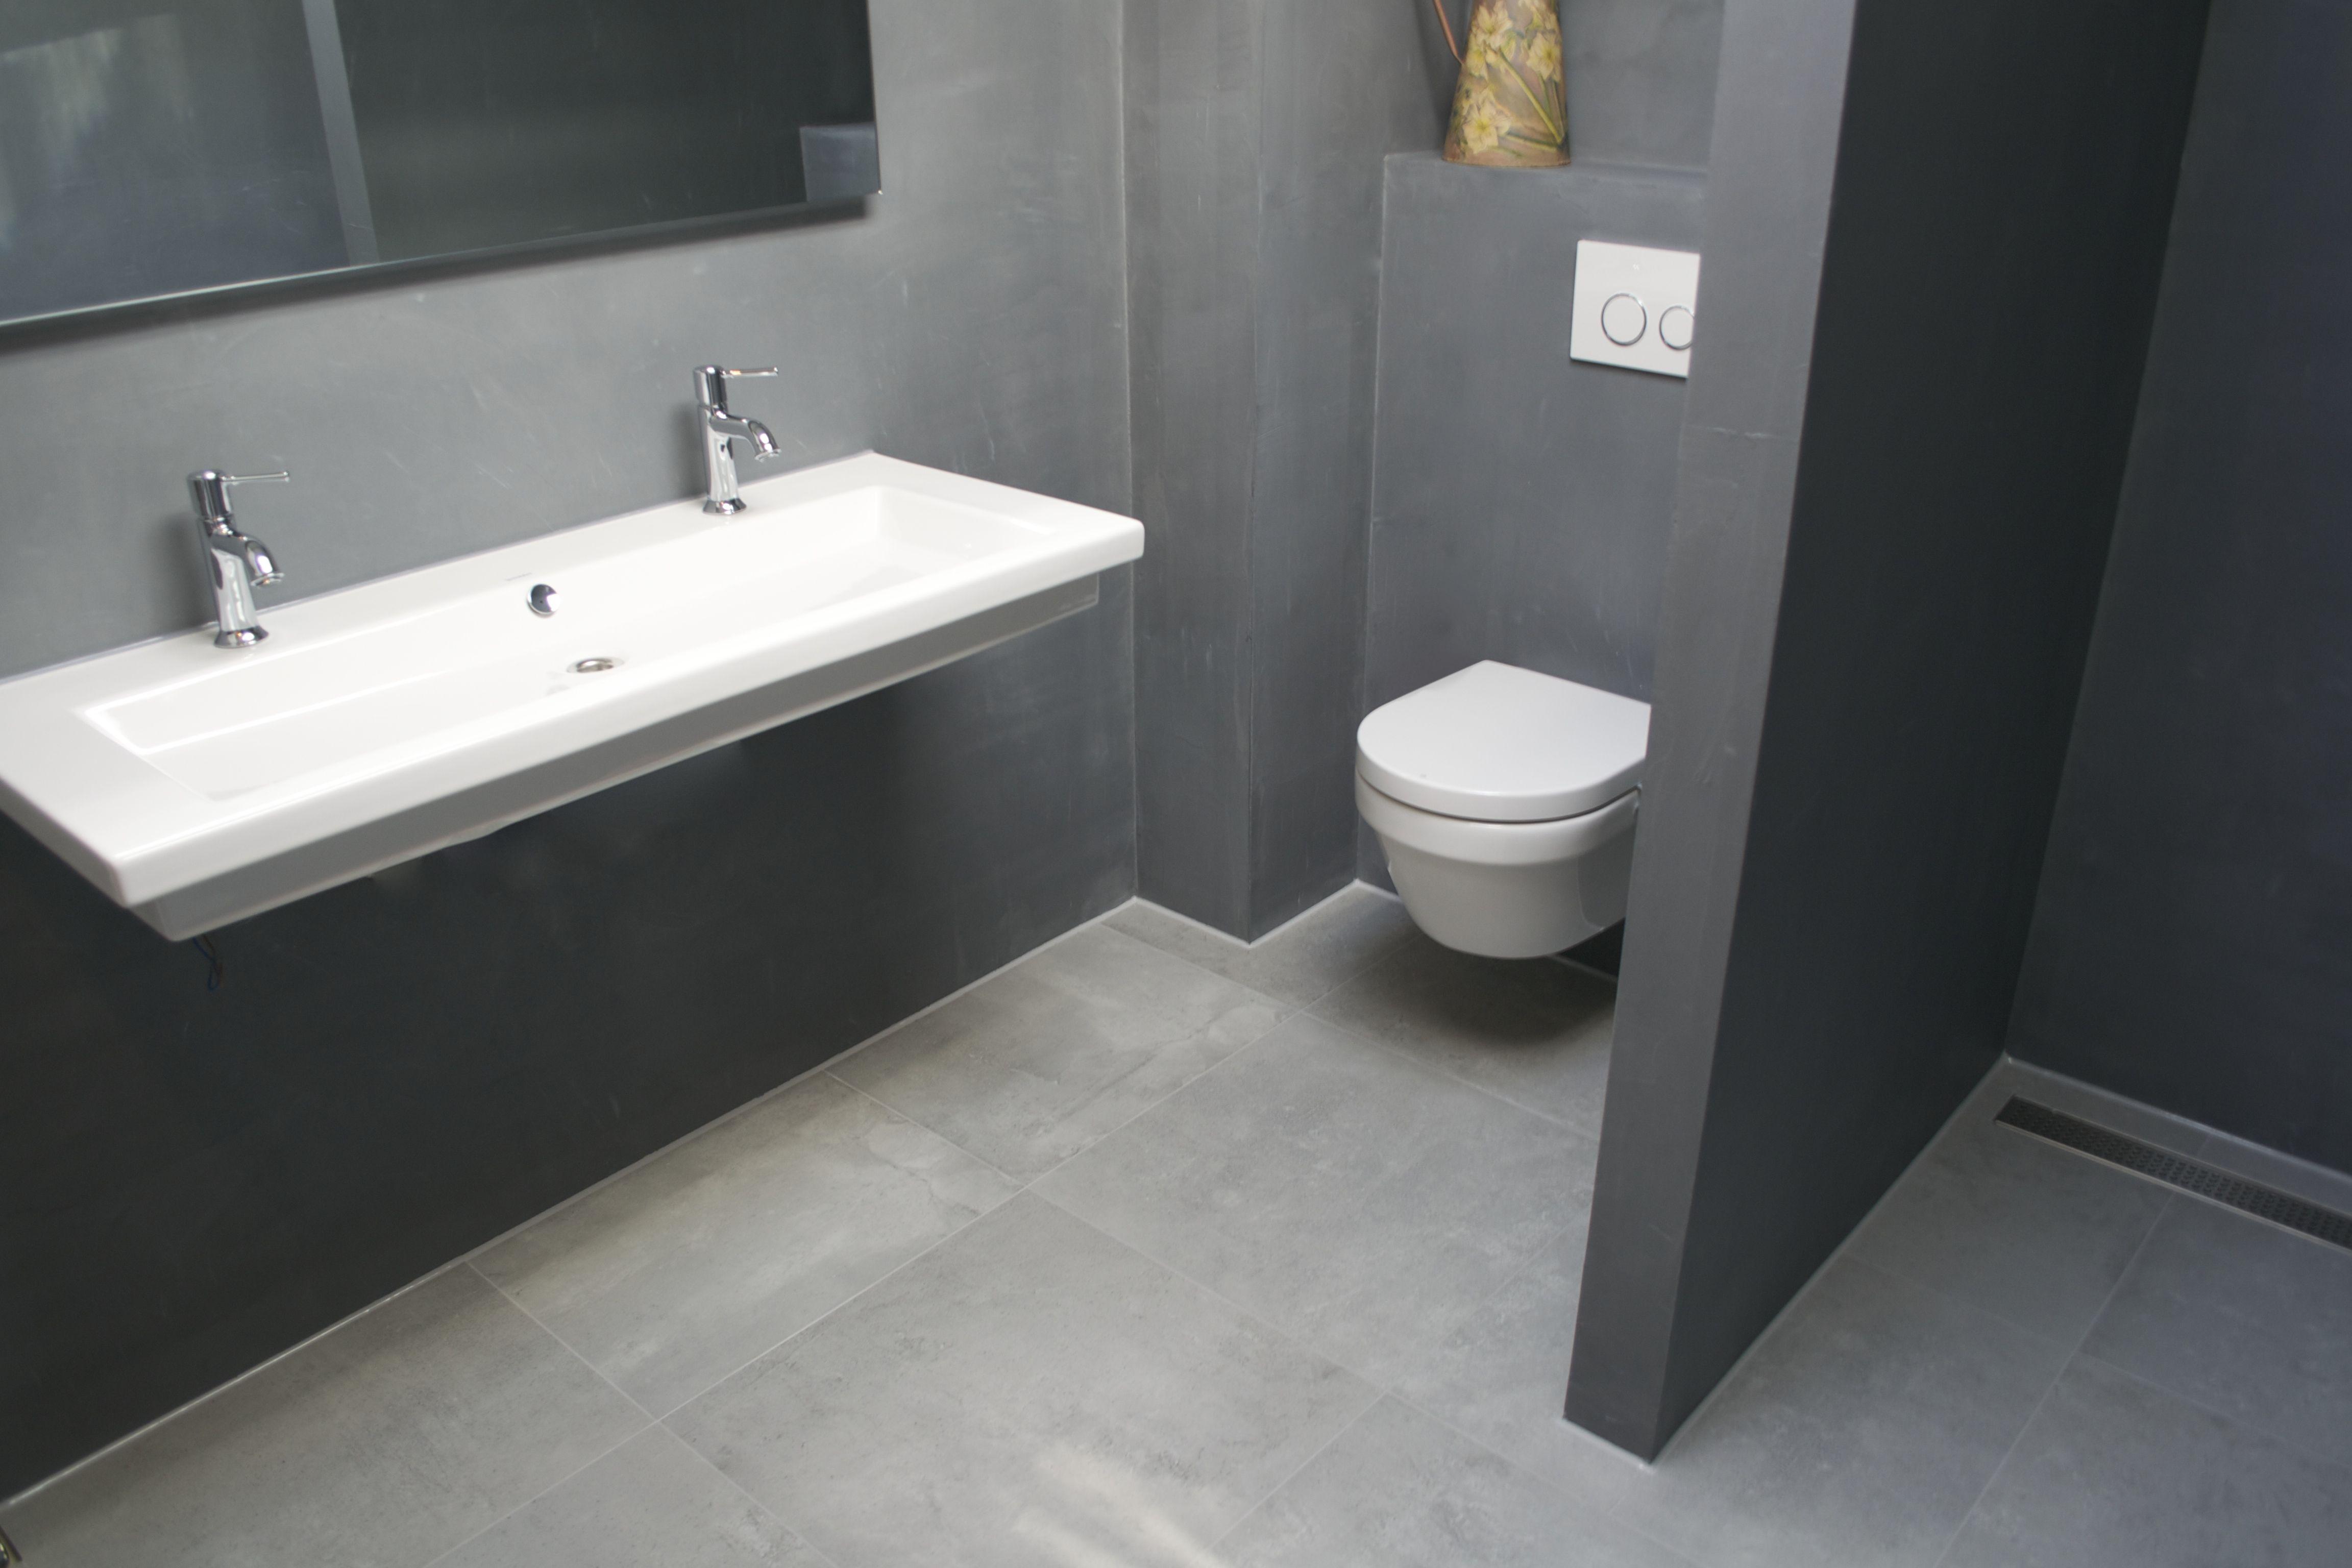 beton cire badkamer m 4608Ã 3072 nieuwbouwhuis pinterest